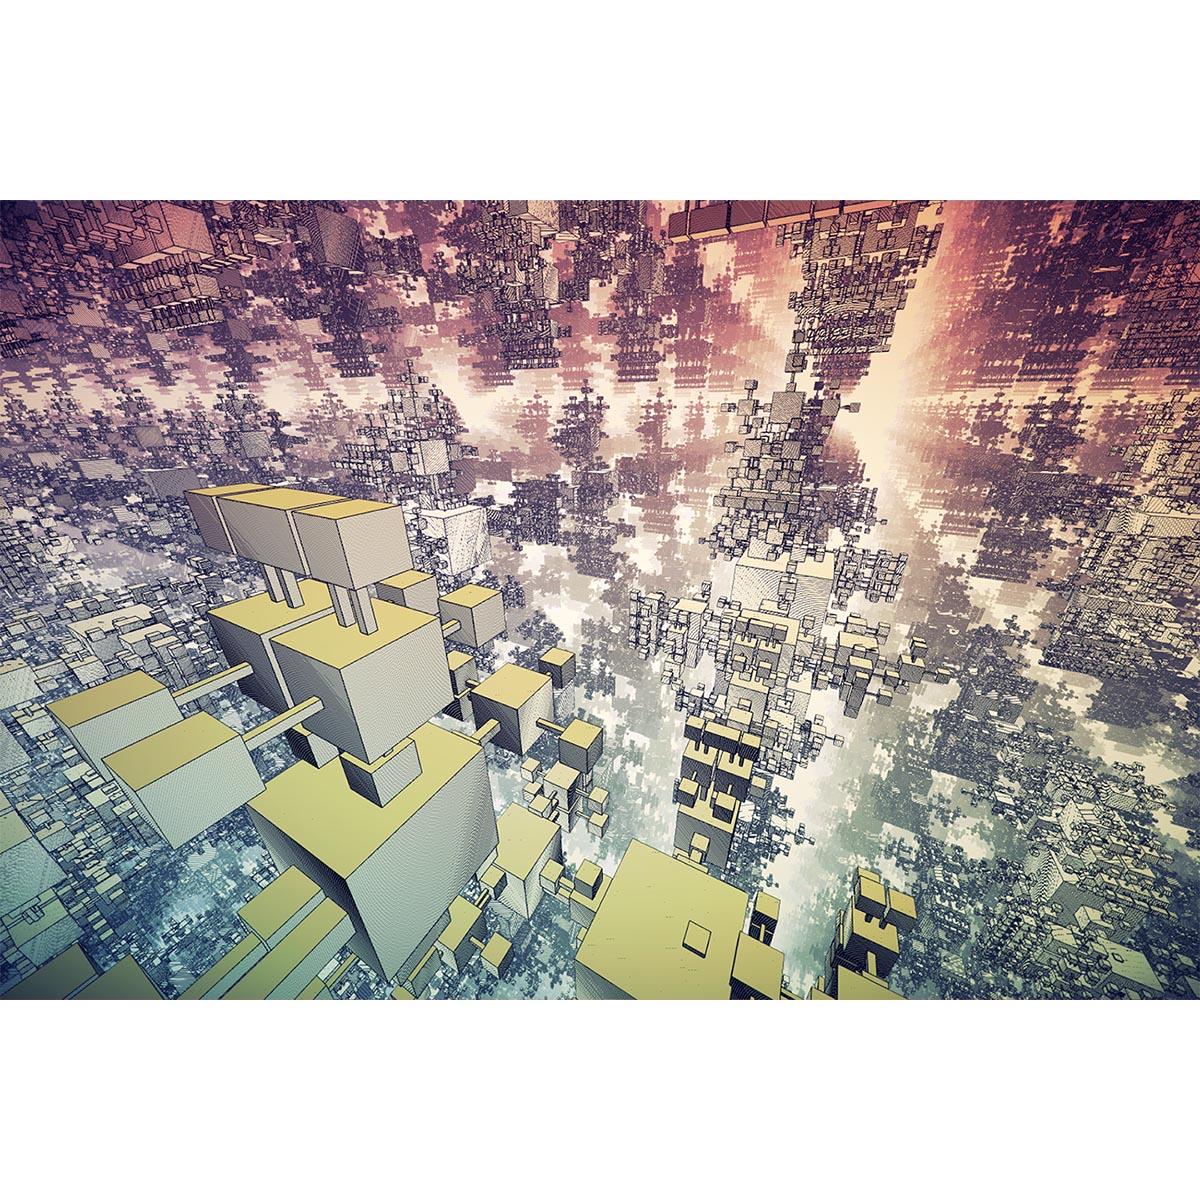 Infinite Architecture No. 1 by William Chyr